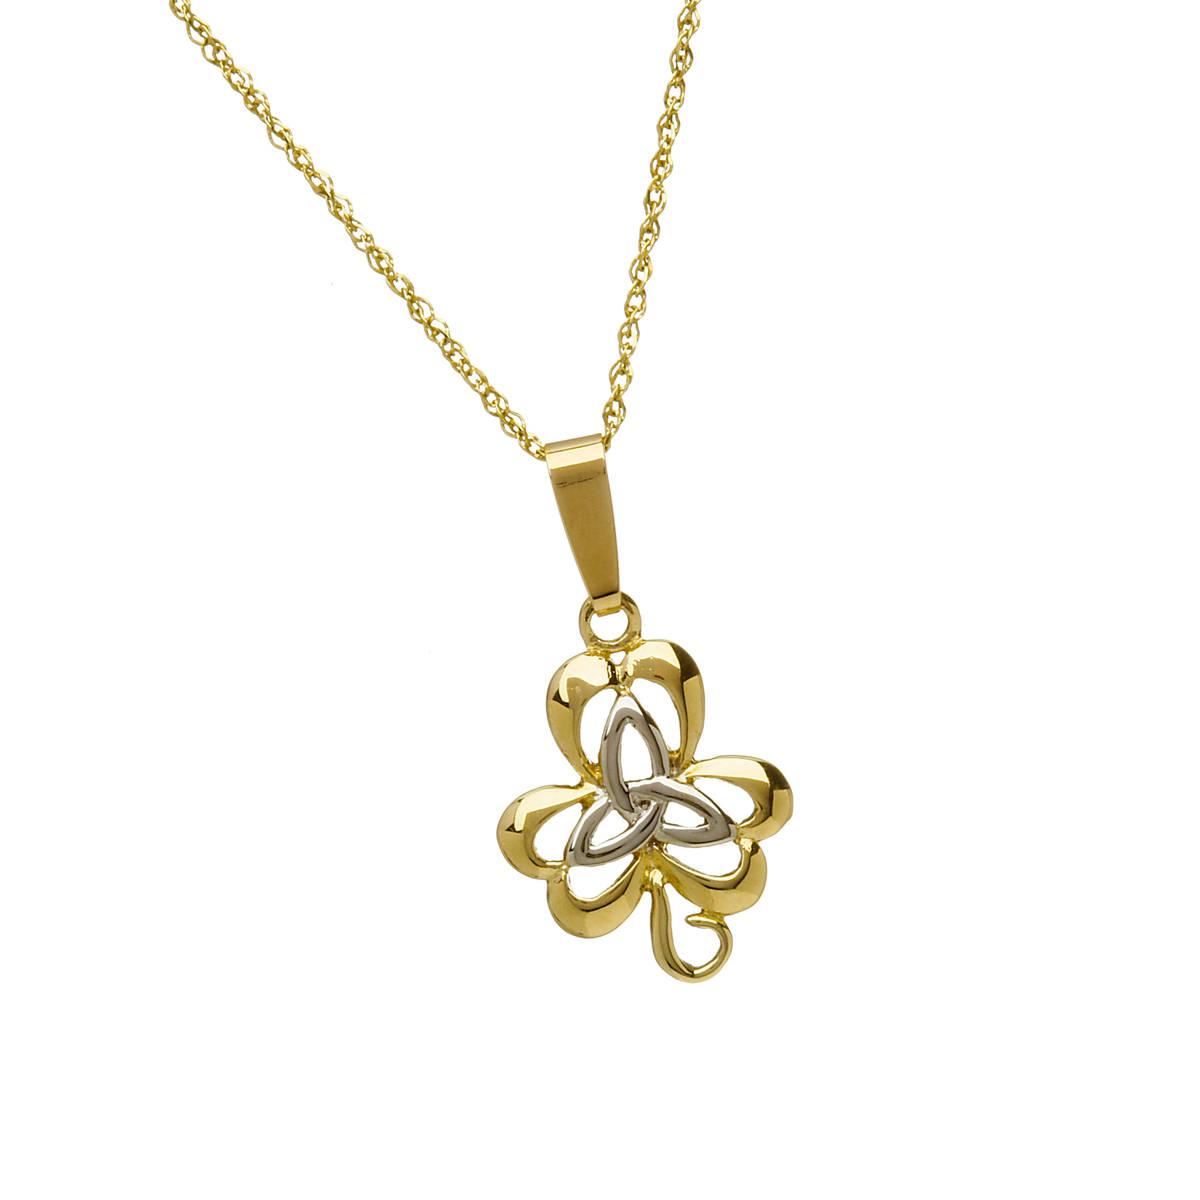 10 ct yellow gold/white gold trinity knot shamrock combination pendant.